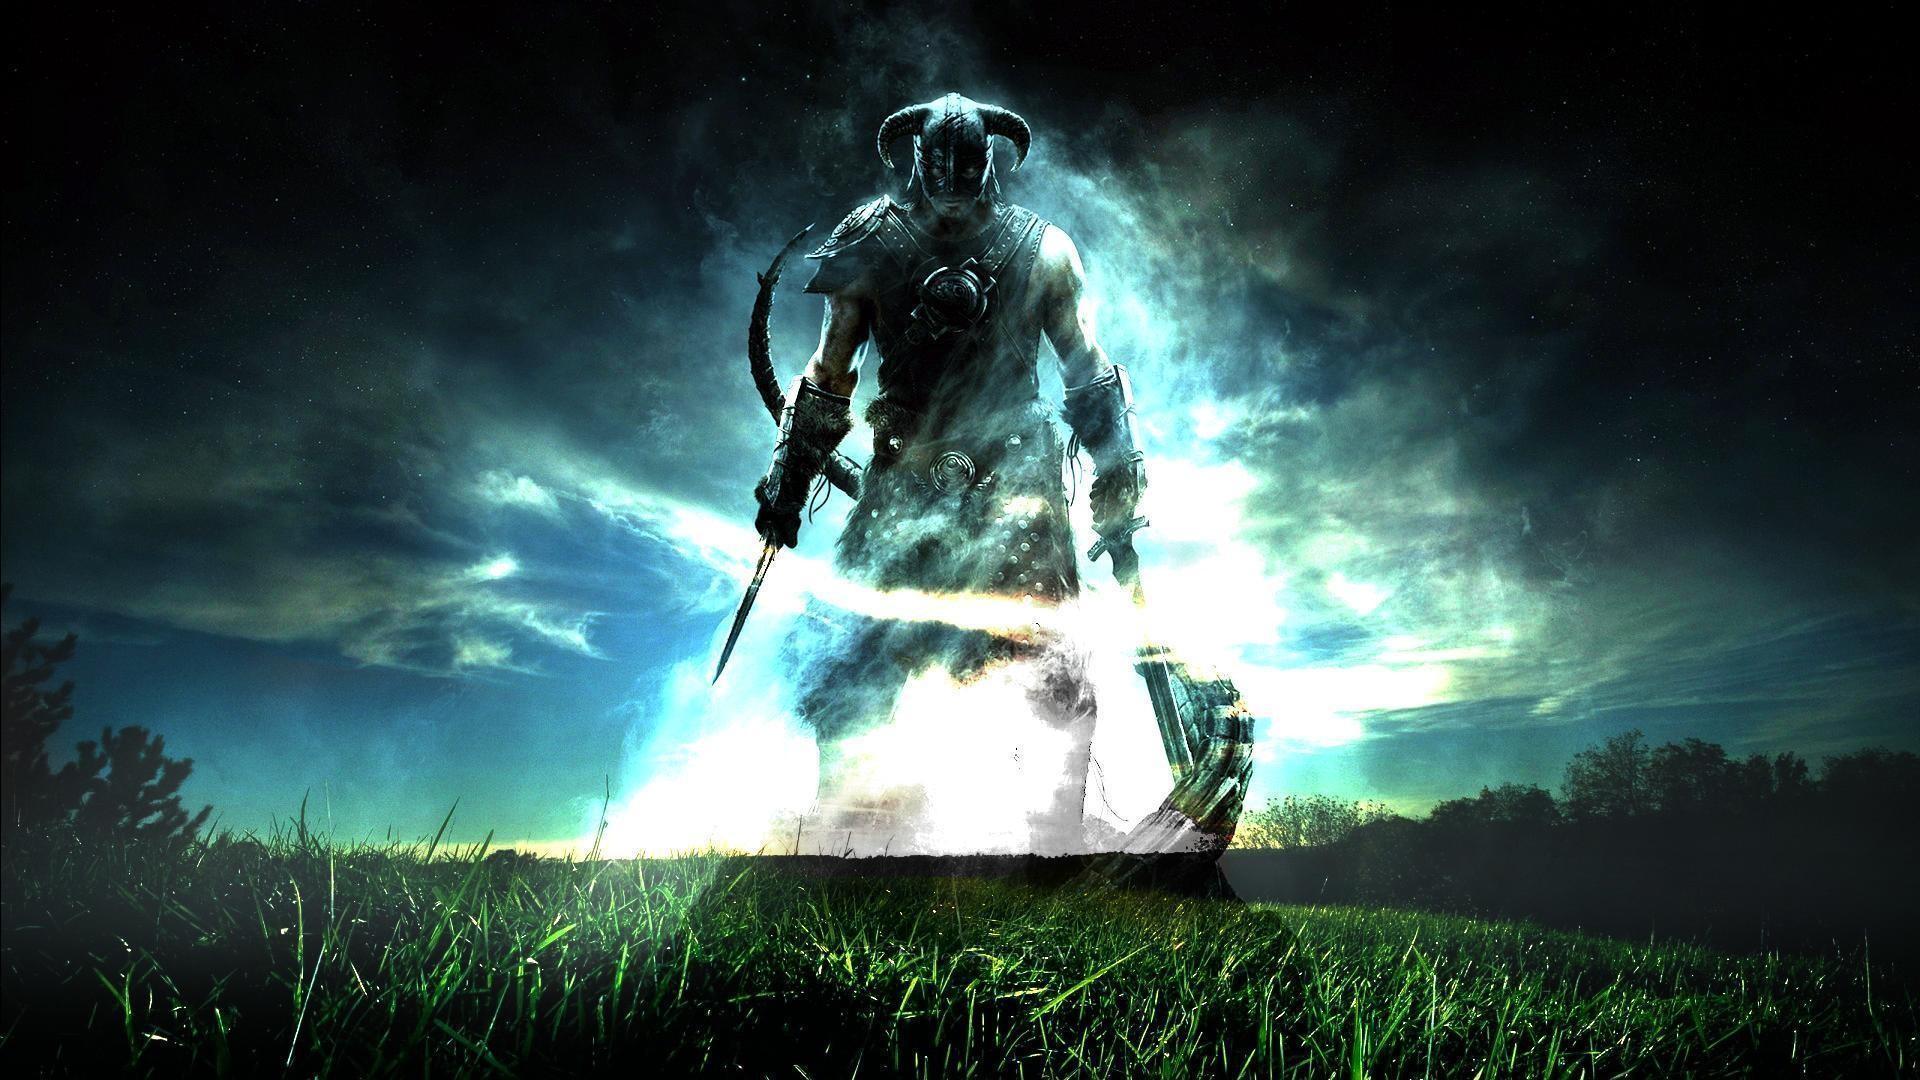 The Elder Scrolls V Skyrim | HD Wallpapers